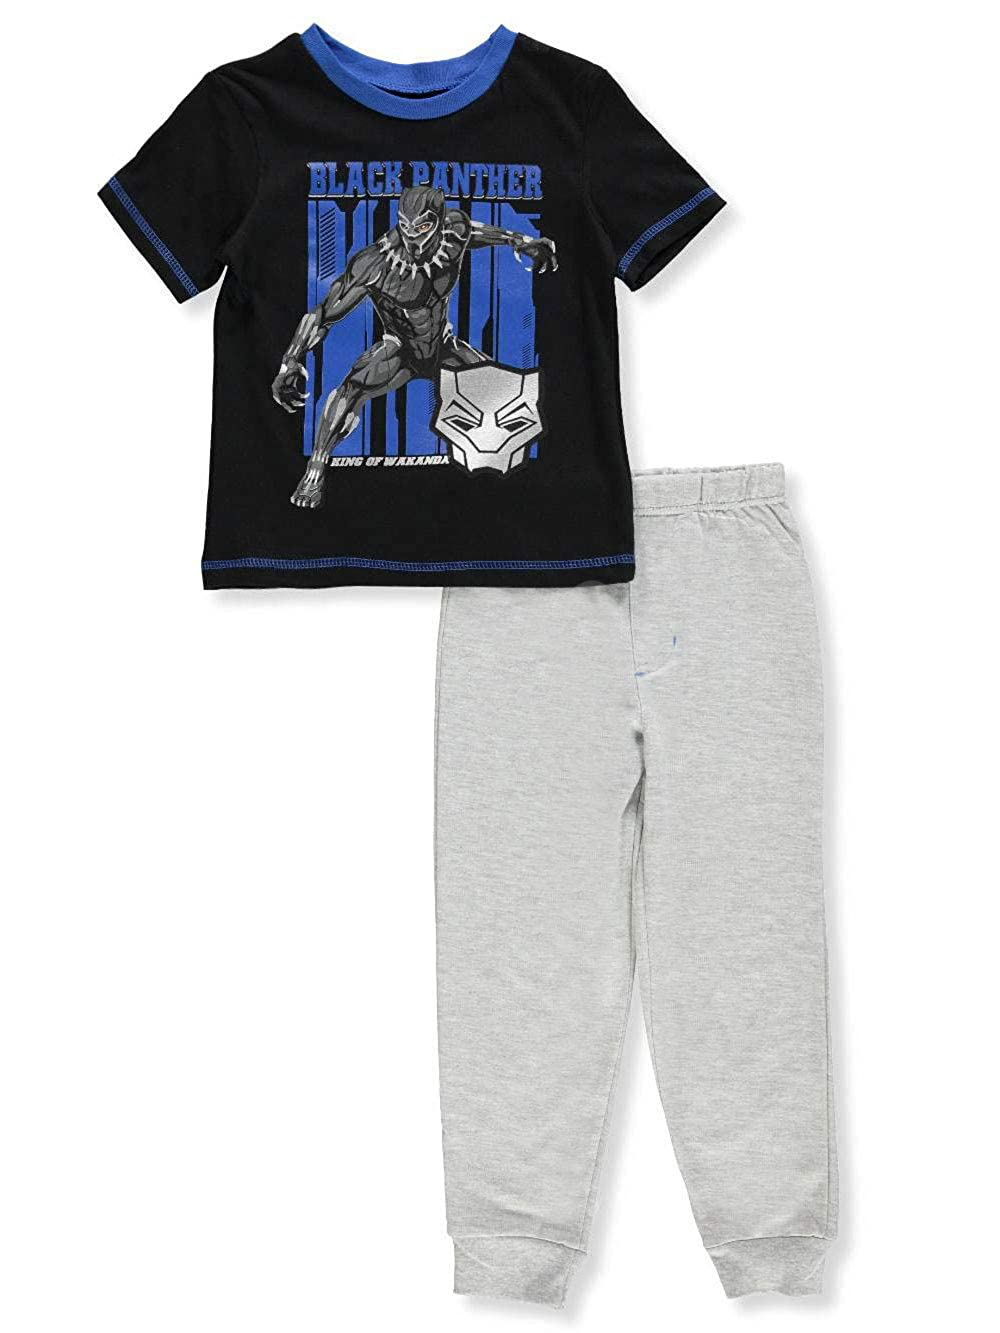 Black Panther Boys' 2-Piece Pants Set Outfit